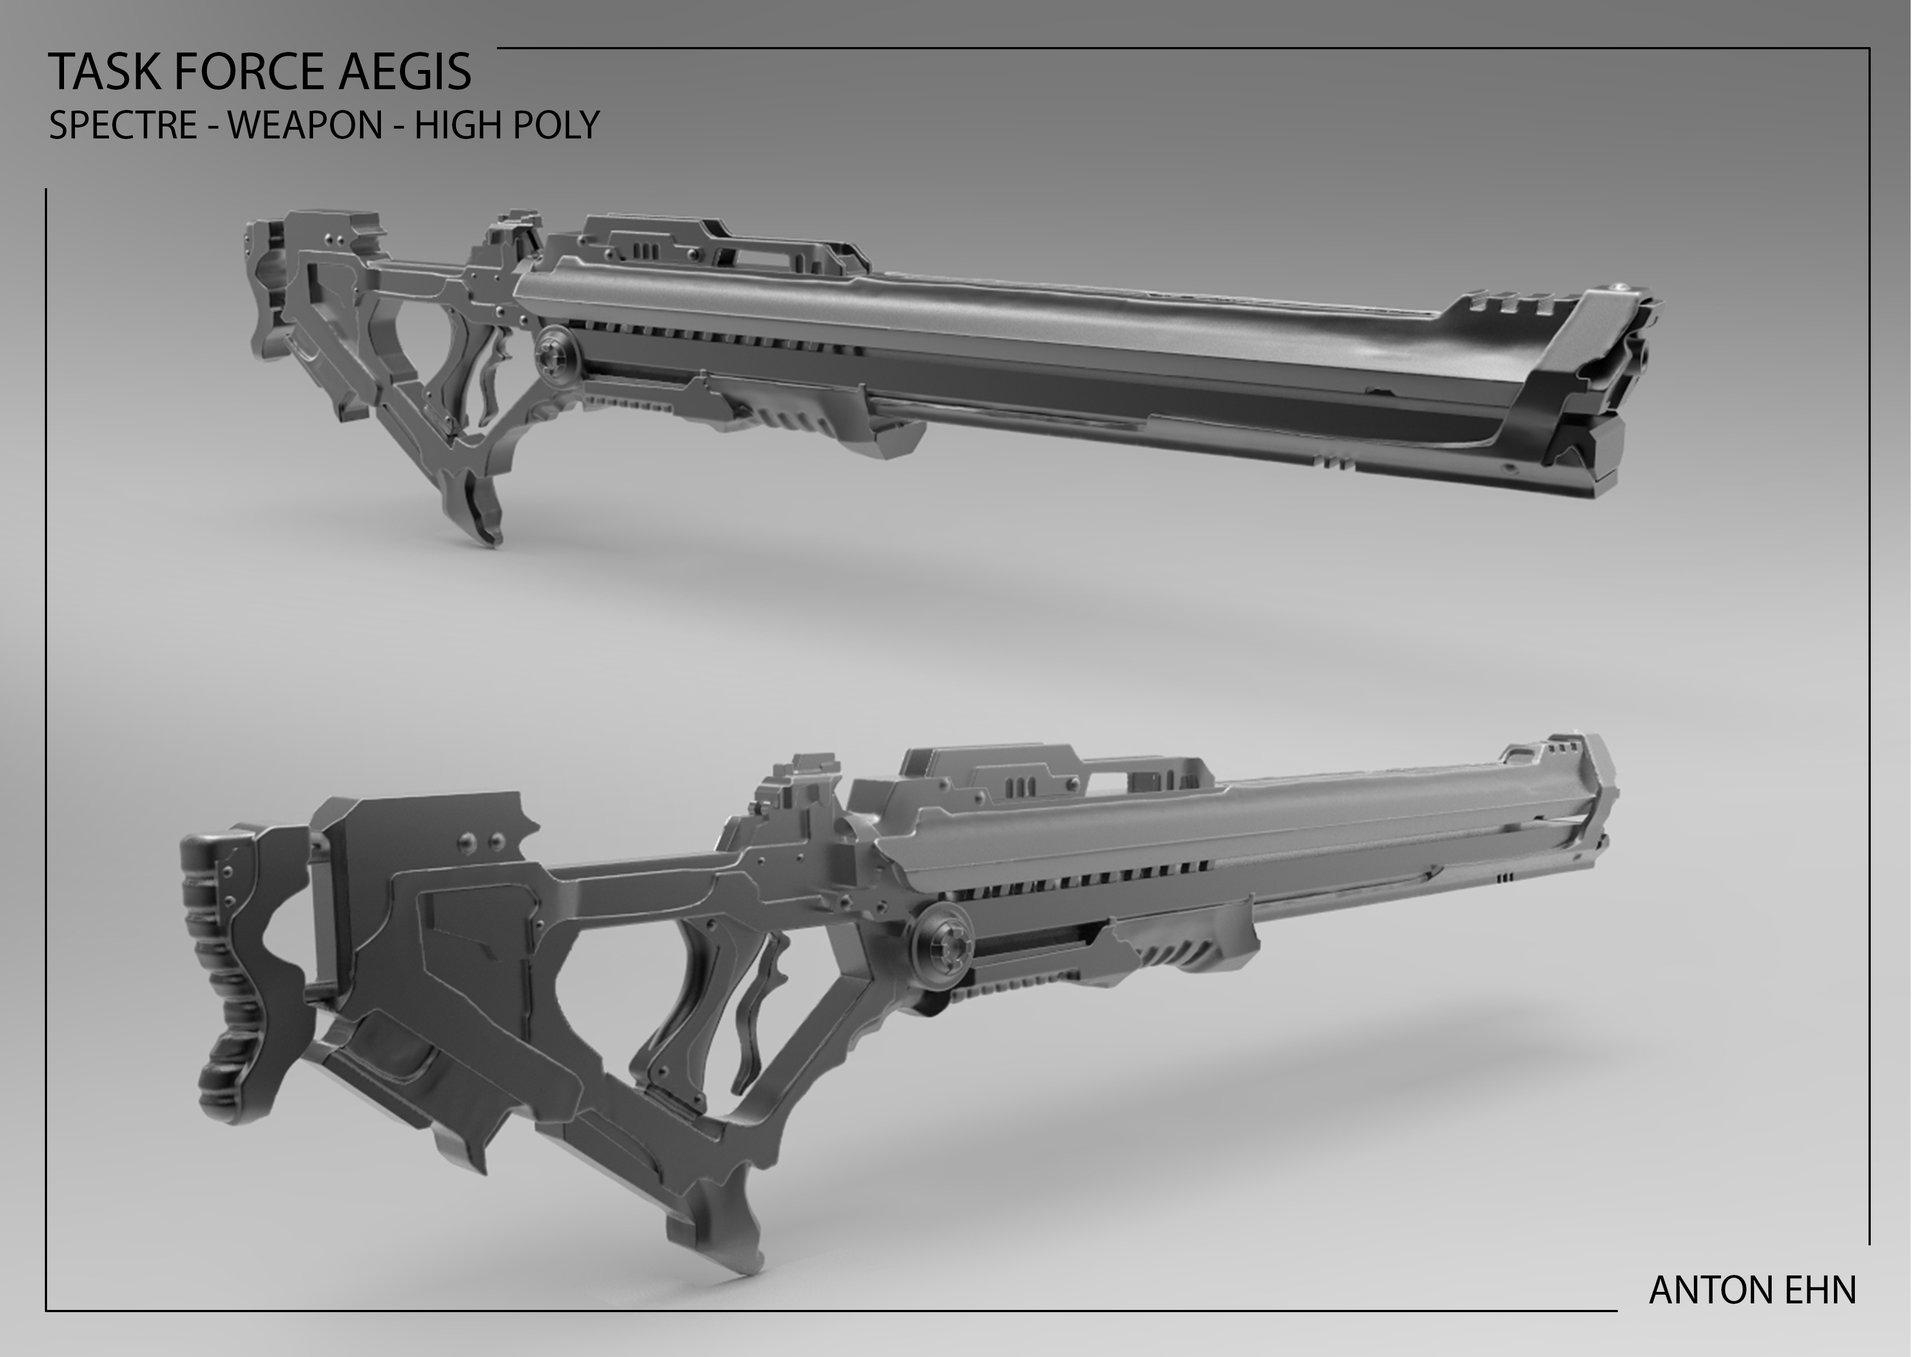 Anton ehn spectre weapon render